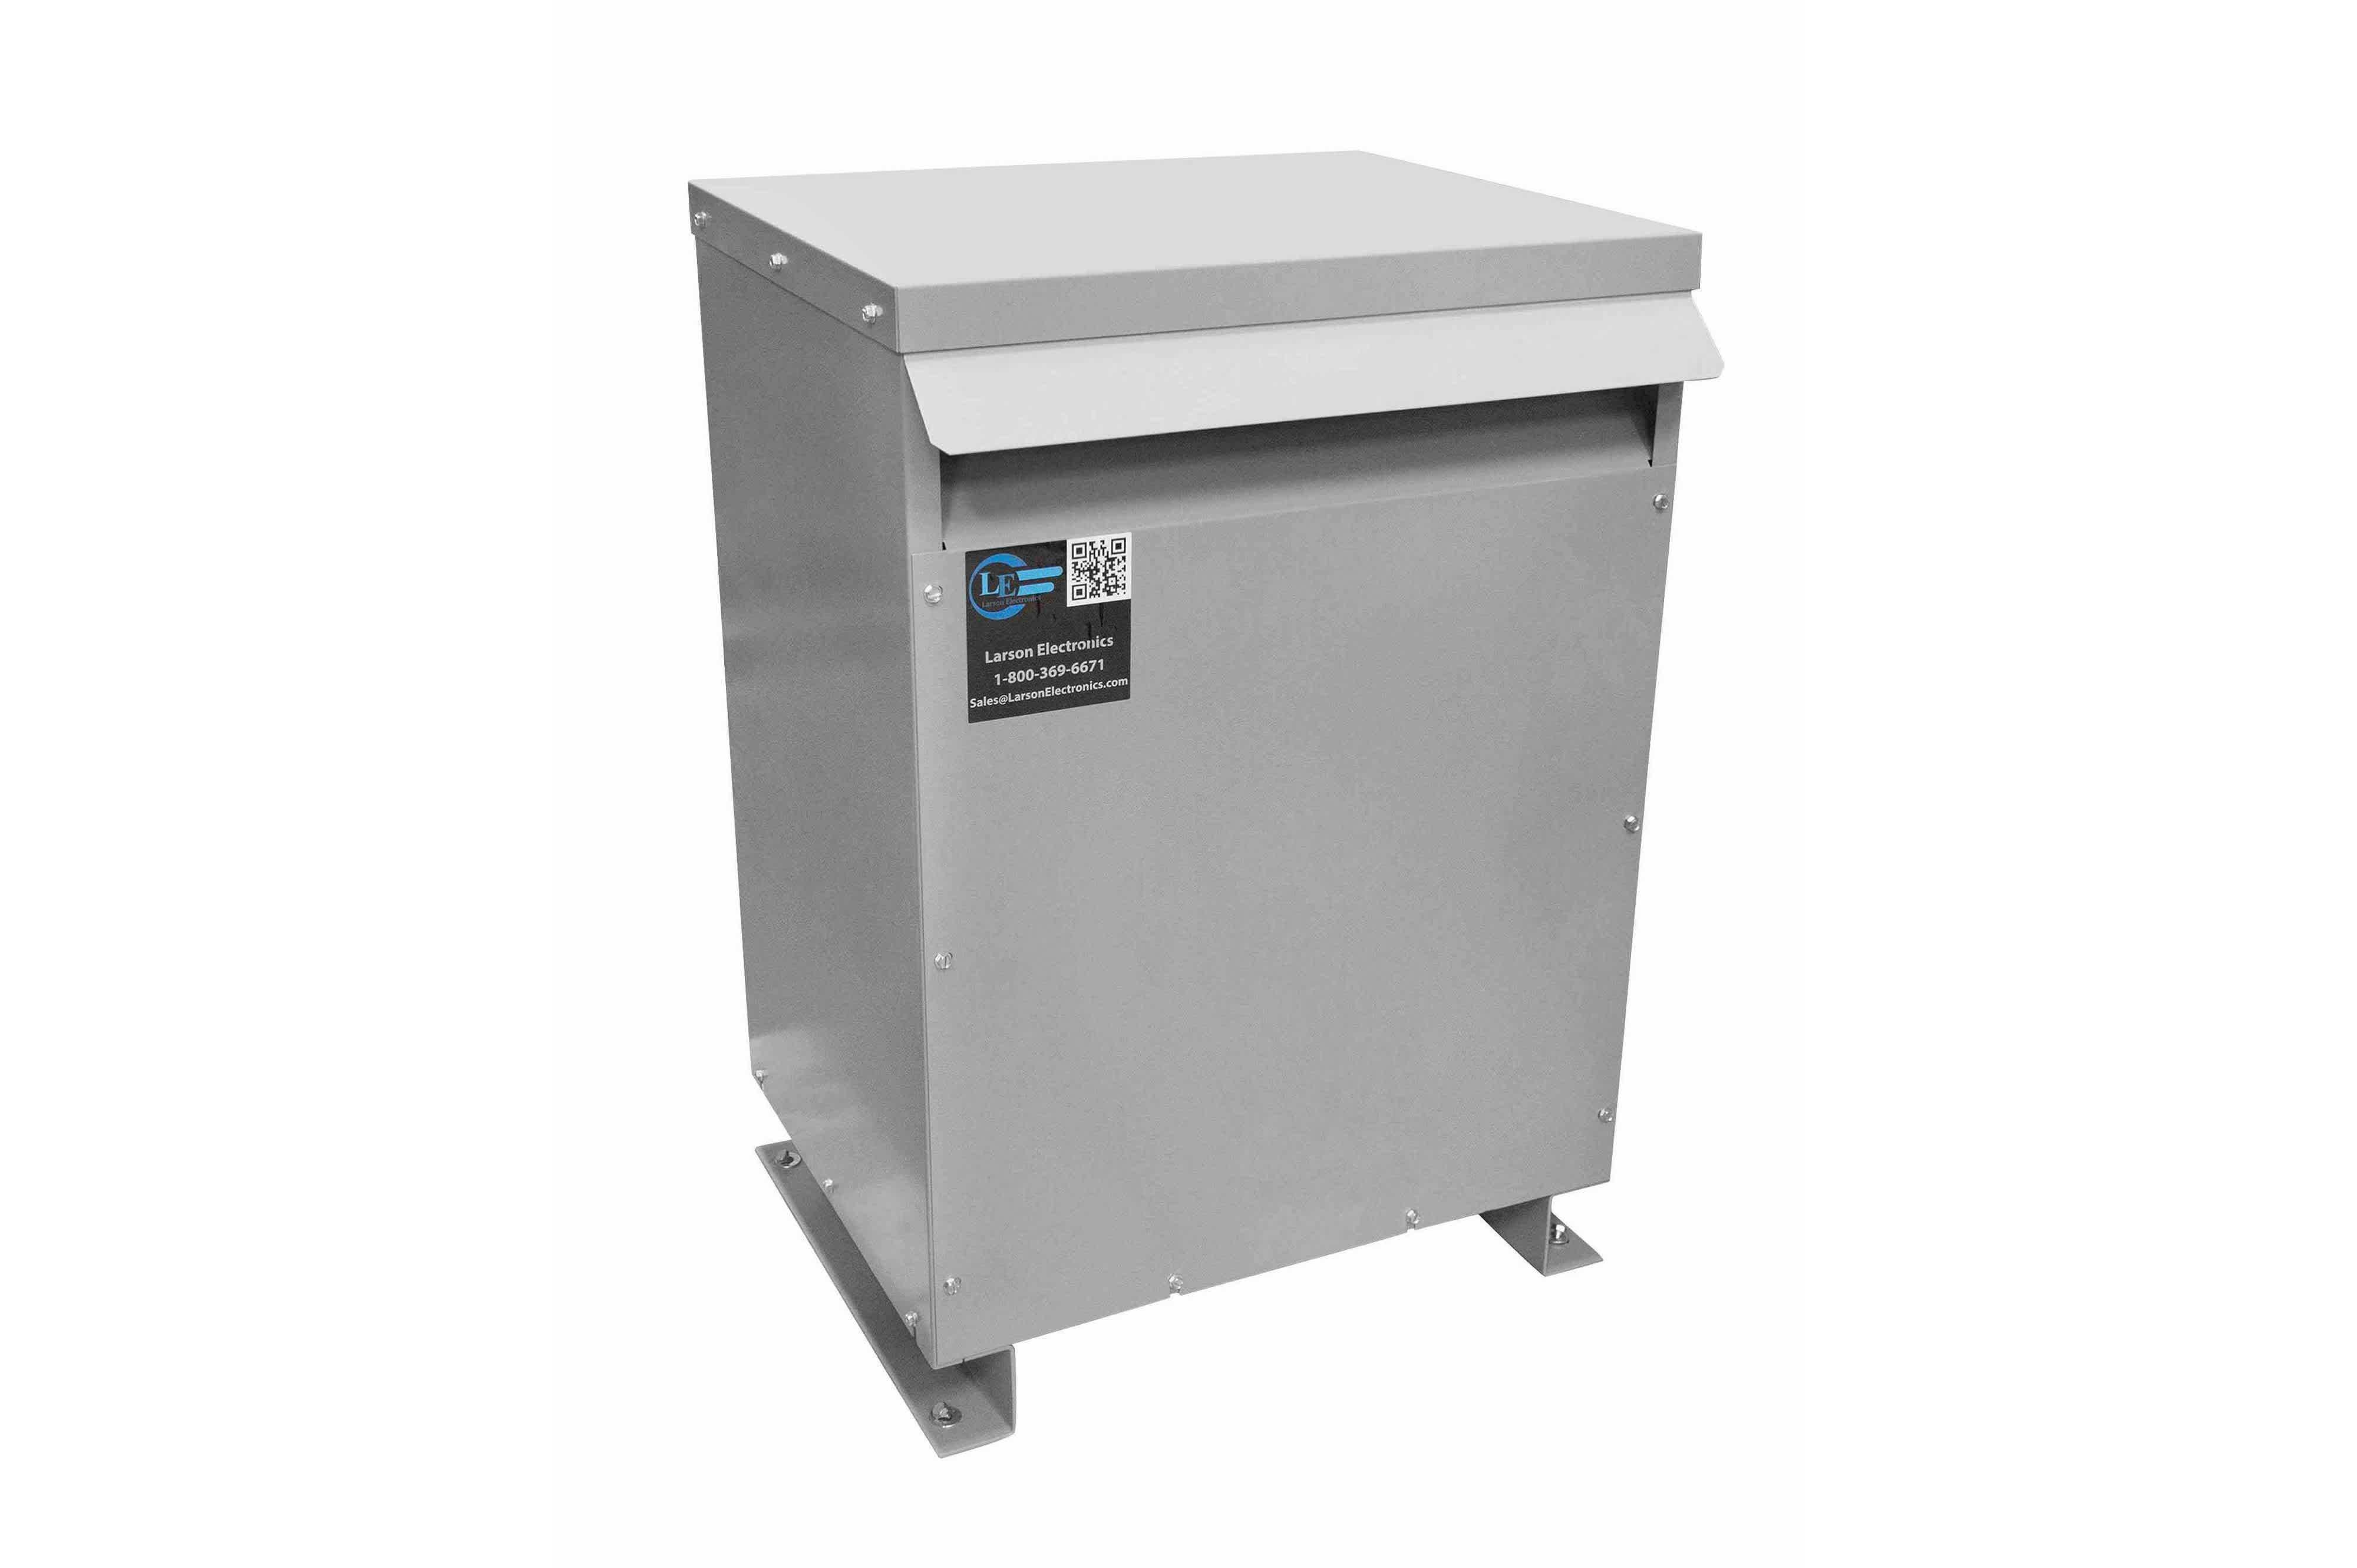 150 kVA 3PH DOE Transformer, 460V Delta Primary, 400Y/231 Wye-N Secondary, N3R, Ventilated, 60 Hz